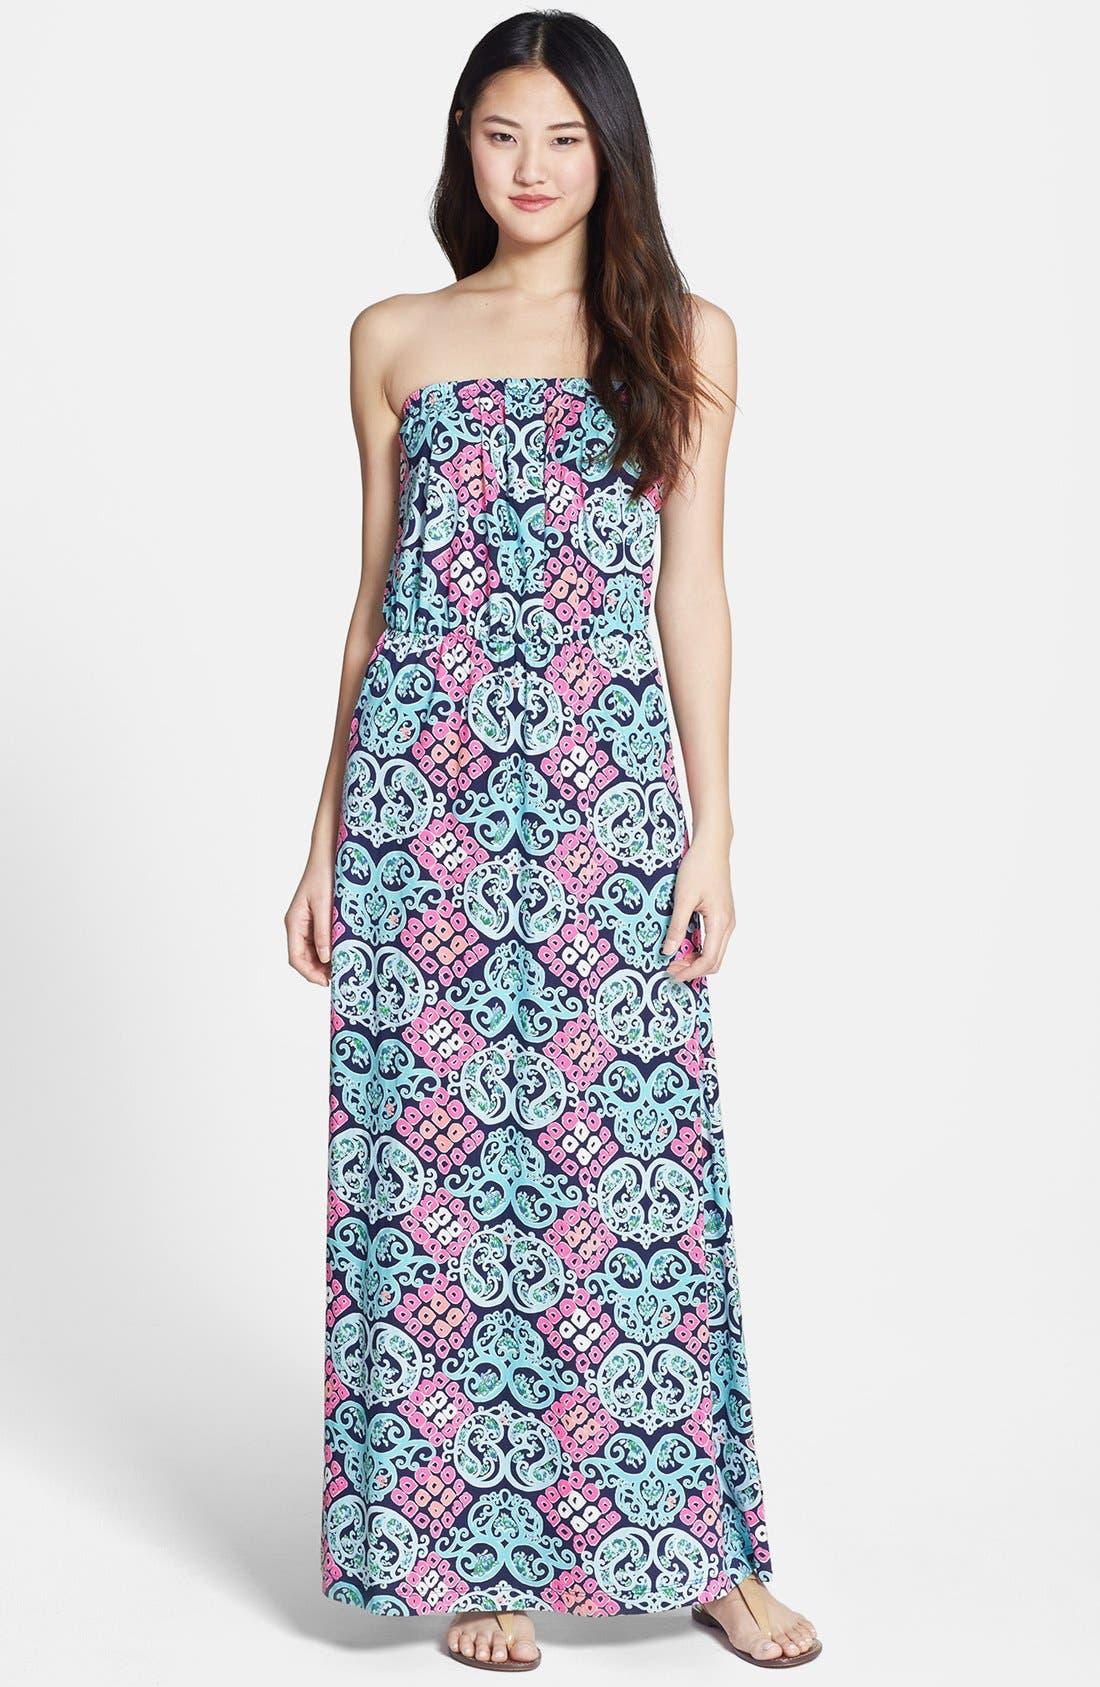 Alternate Image 1 Selected - Lilly Pulitzer® 'Marlisa' Print Cotton Maxi Dress